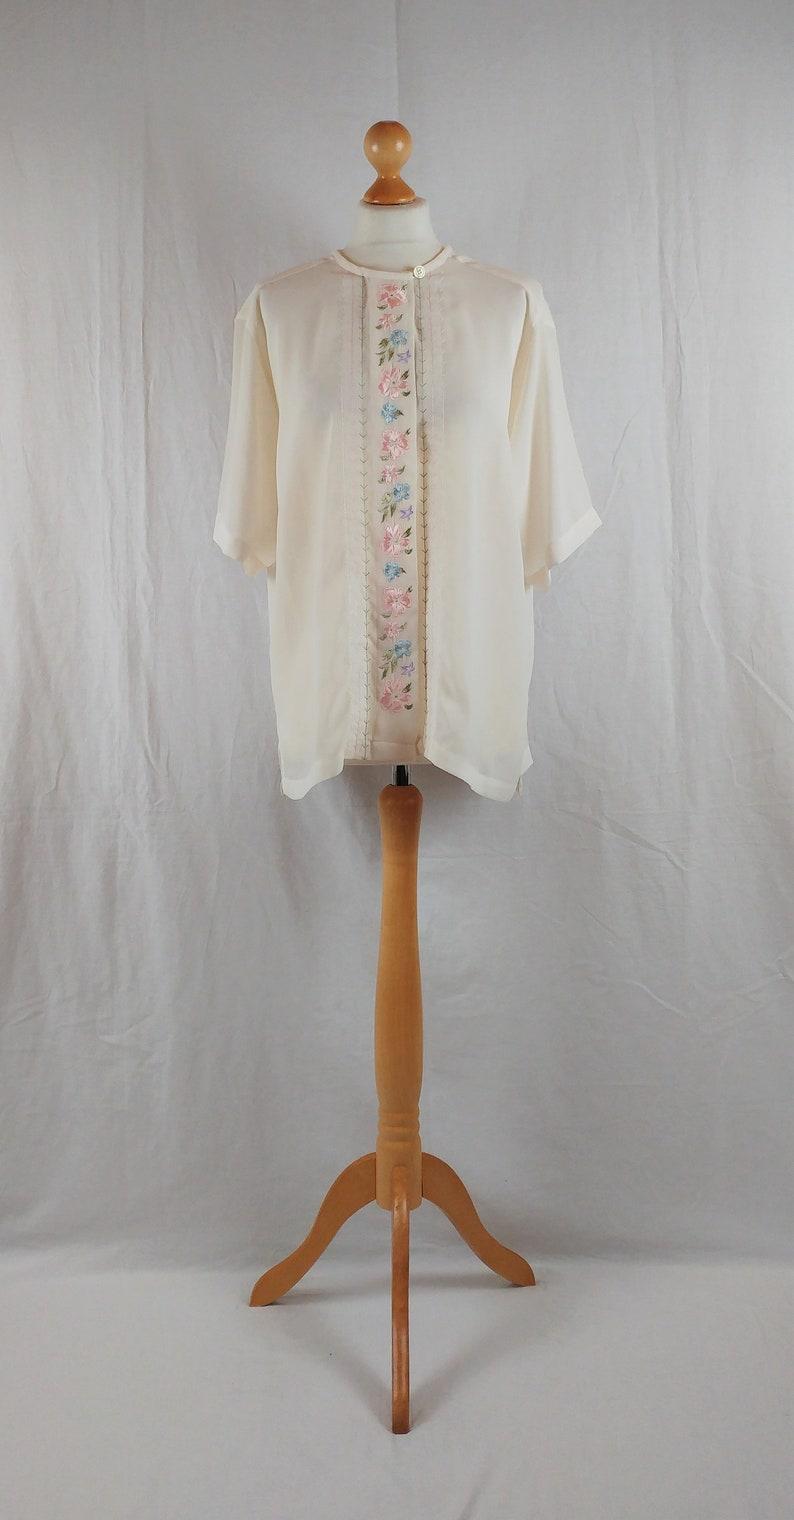 Vintage Claus 1980s Pastel /& Cream Floral Embroided Blouse